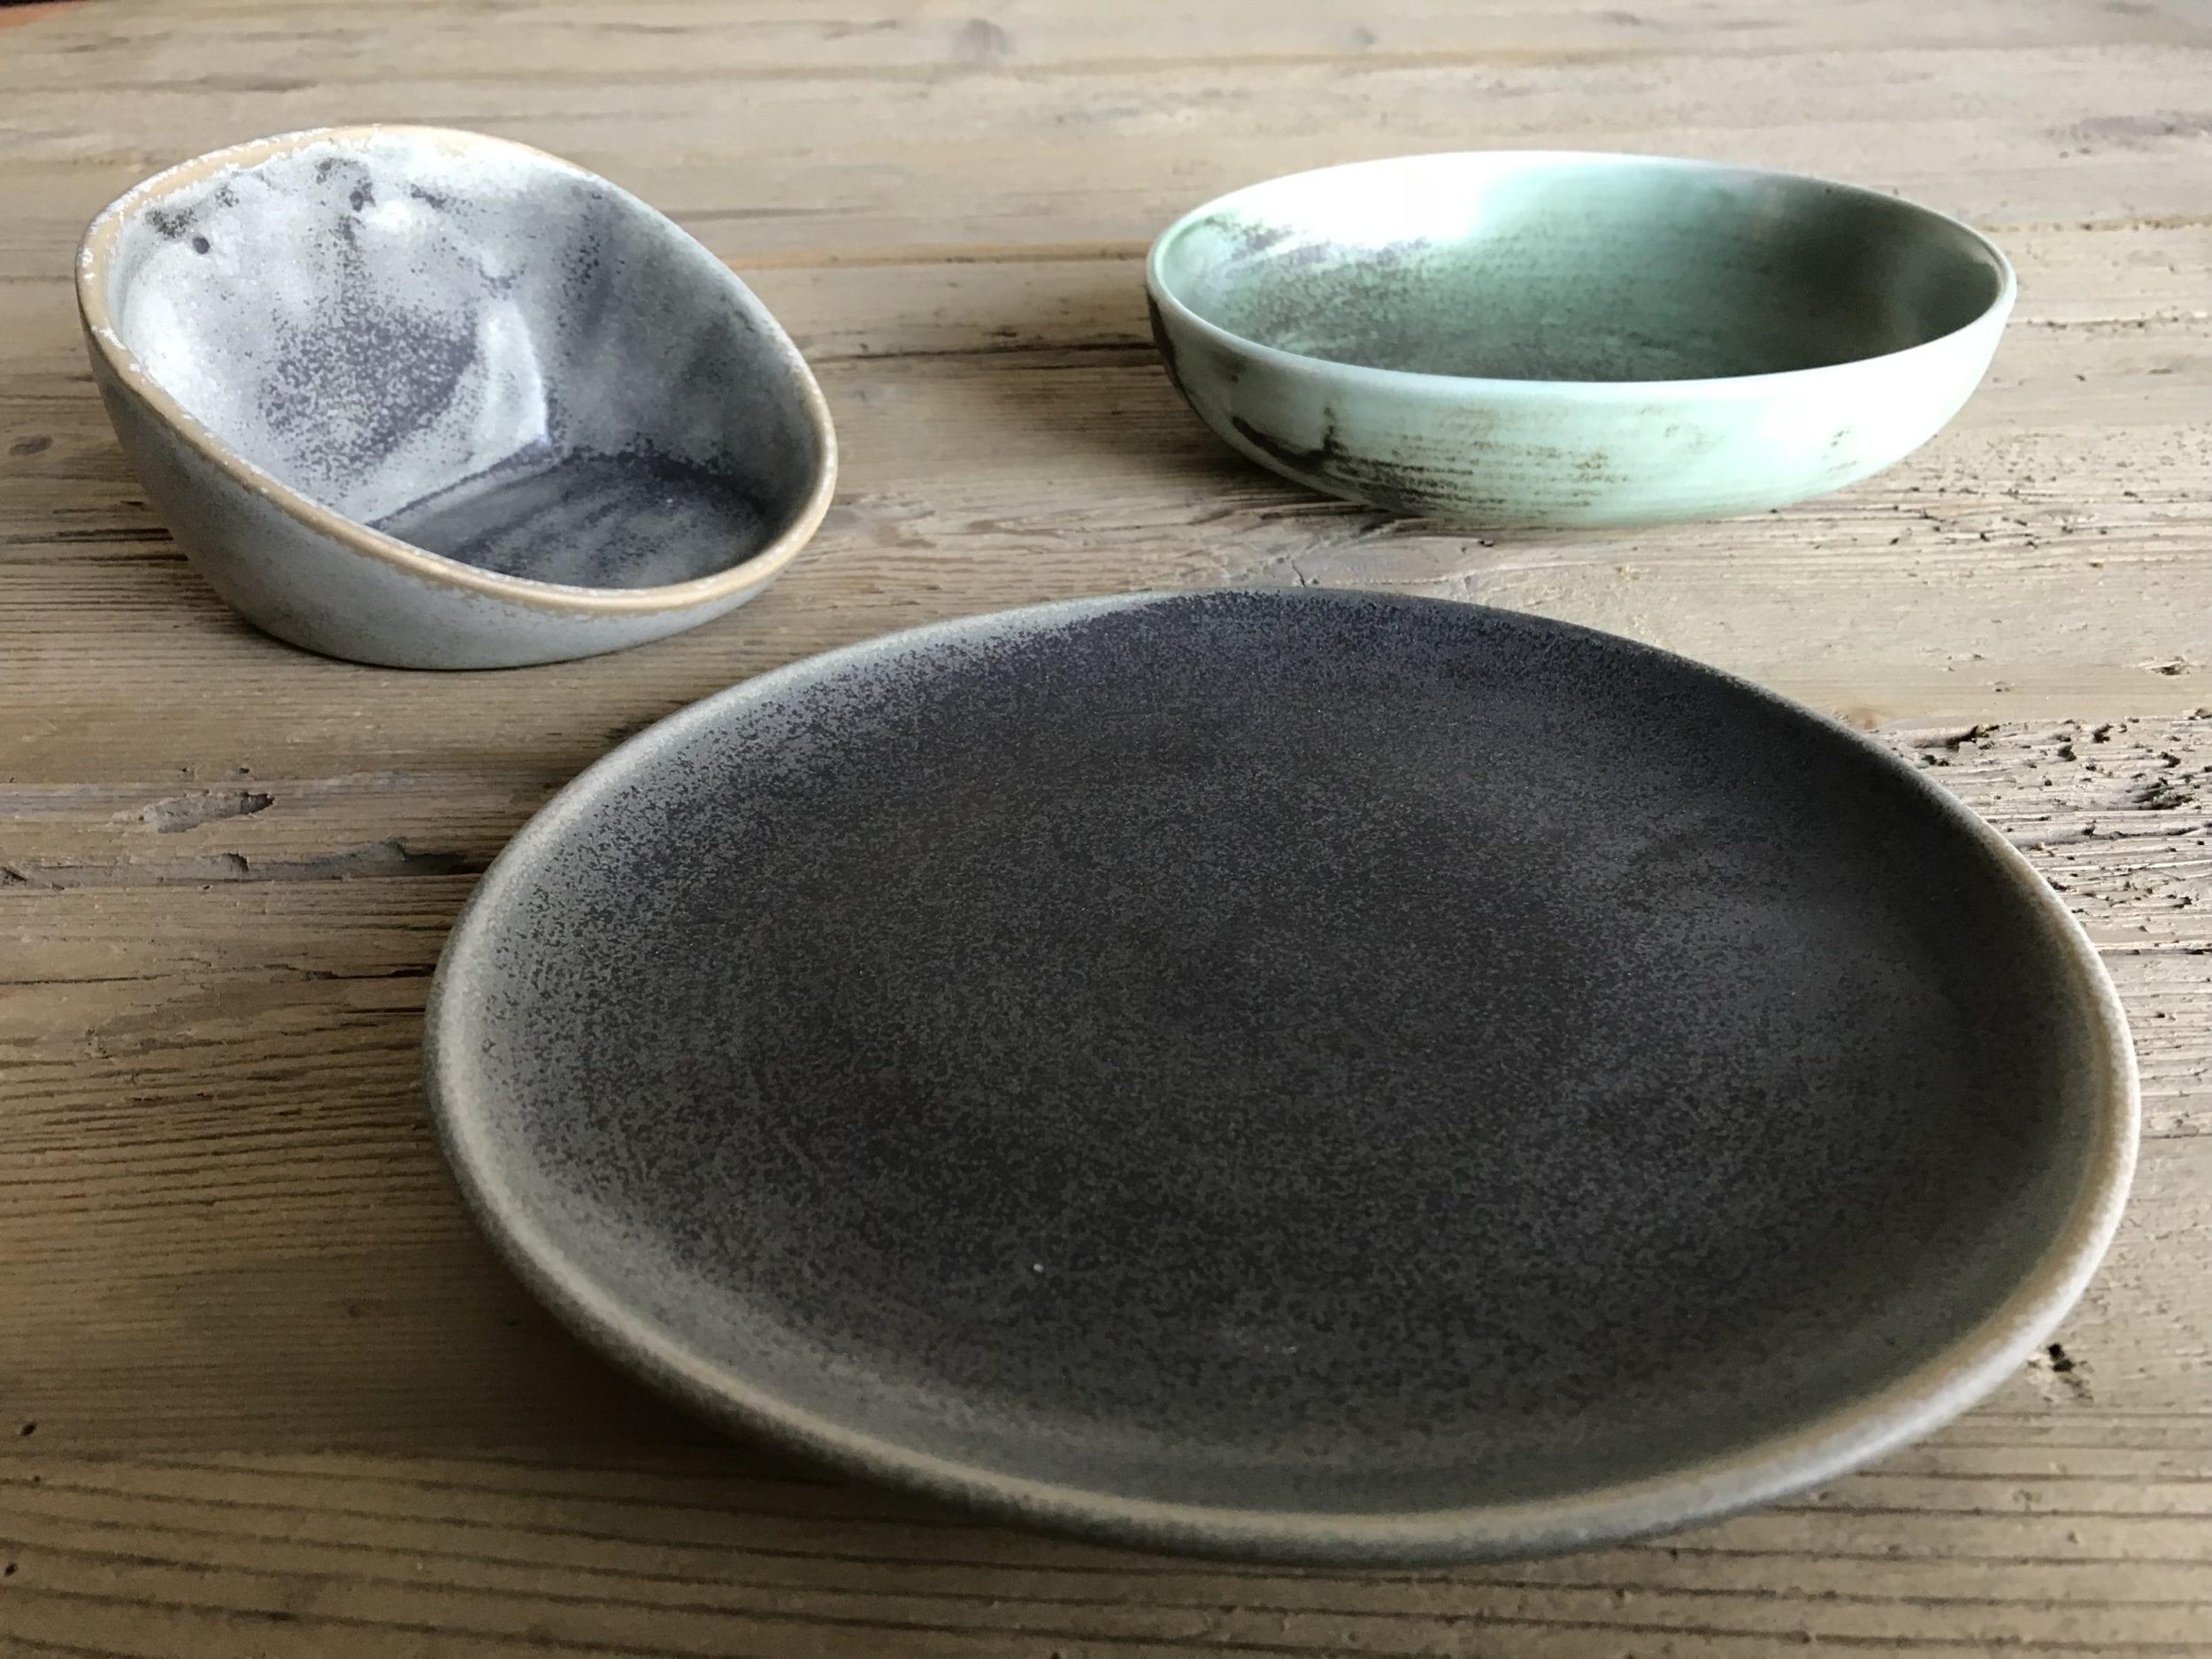 rochini diego 1 DIEGO   minimalism and functionality in essence